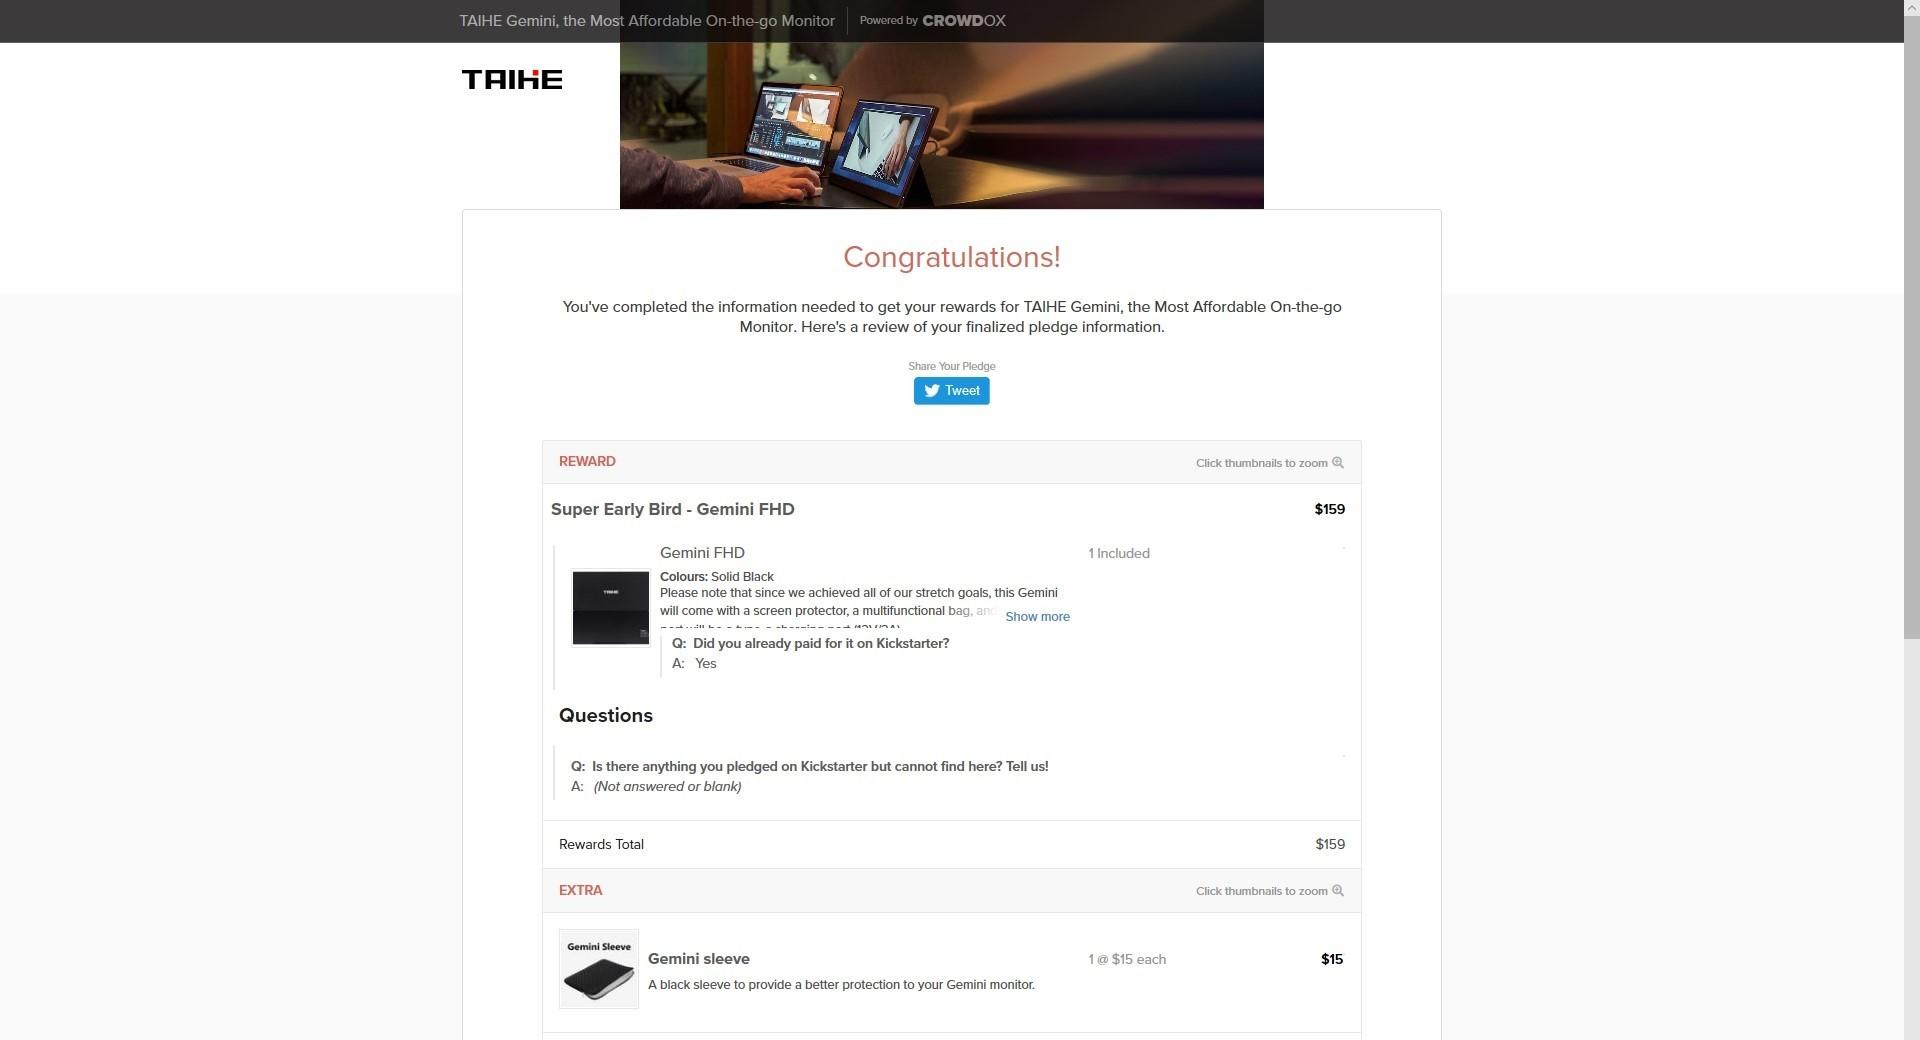 TAIHE Gemini - Step 10